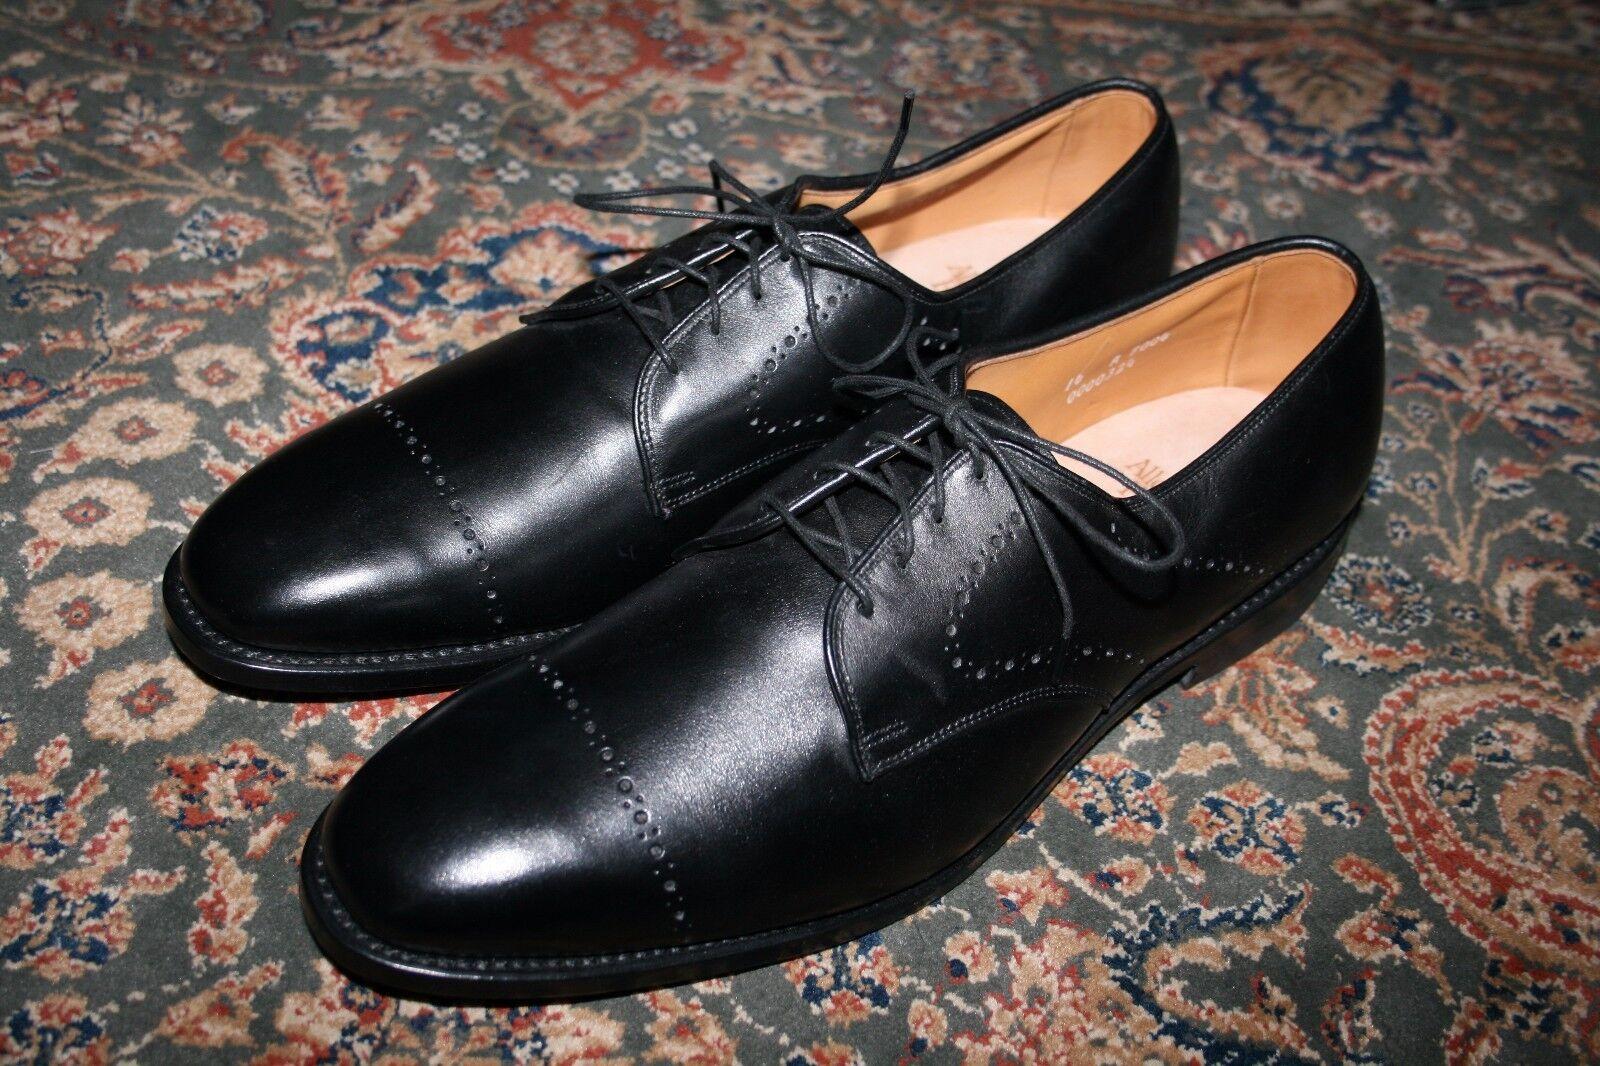 MINT Allen Edmonds Troy Black Leather Perforated Cap Toe Oxford Dress shoes 14 A